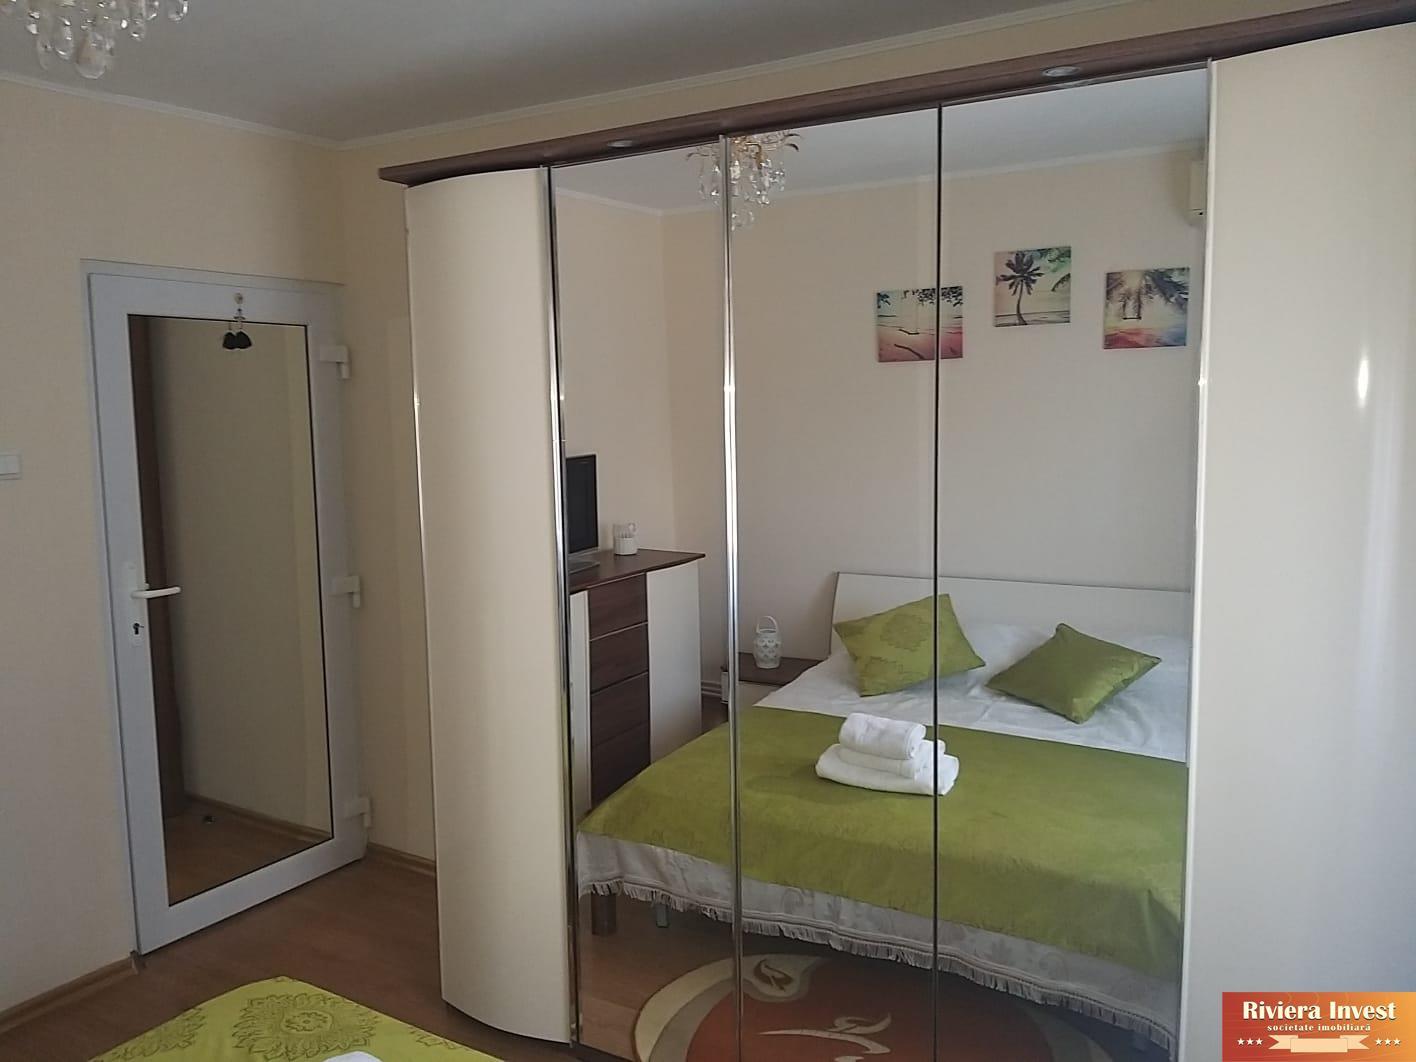 FALEZA NORD UNIVERSITATE OVIDIUS NEVERSEA apartament 2 camere lux de închiriat